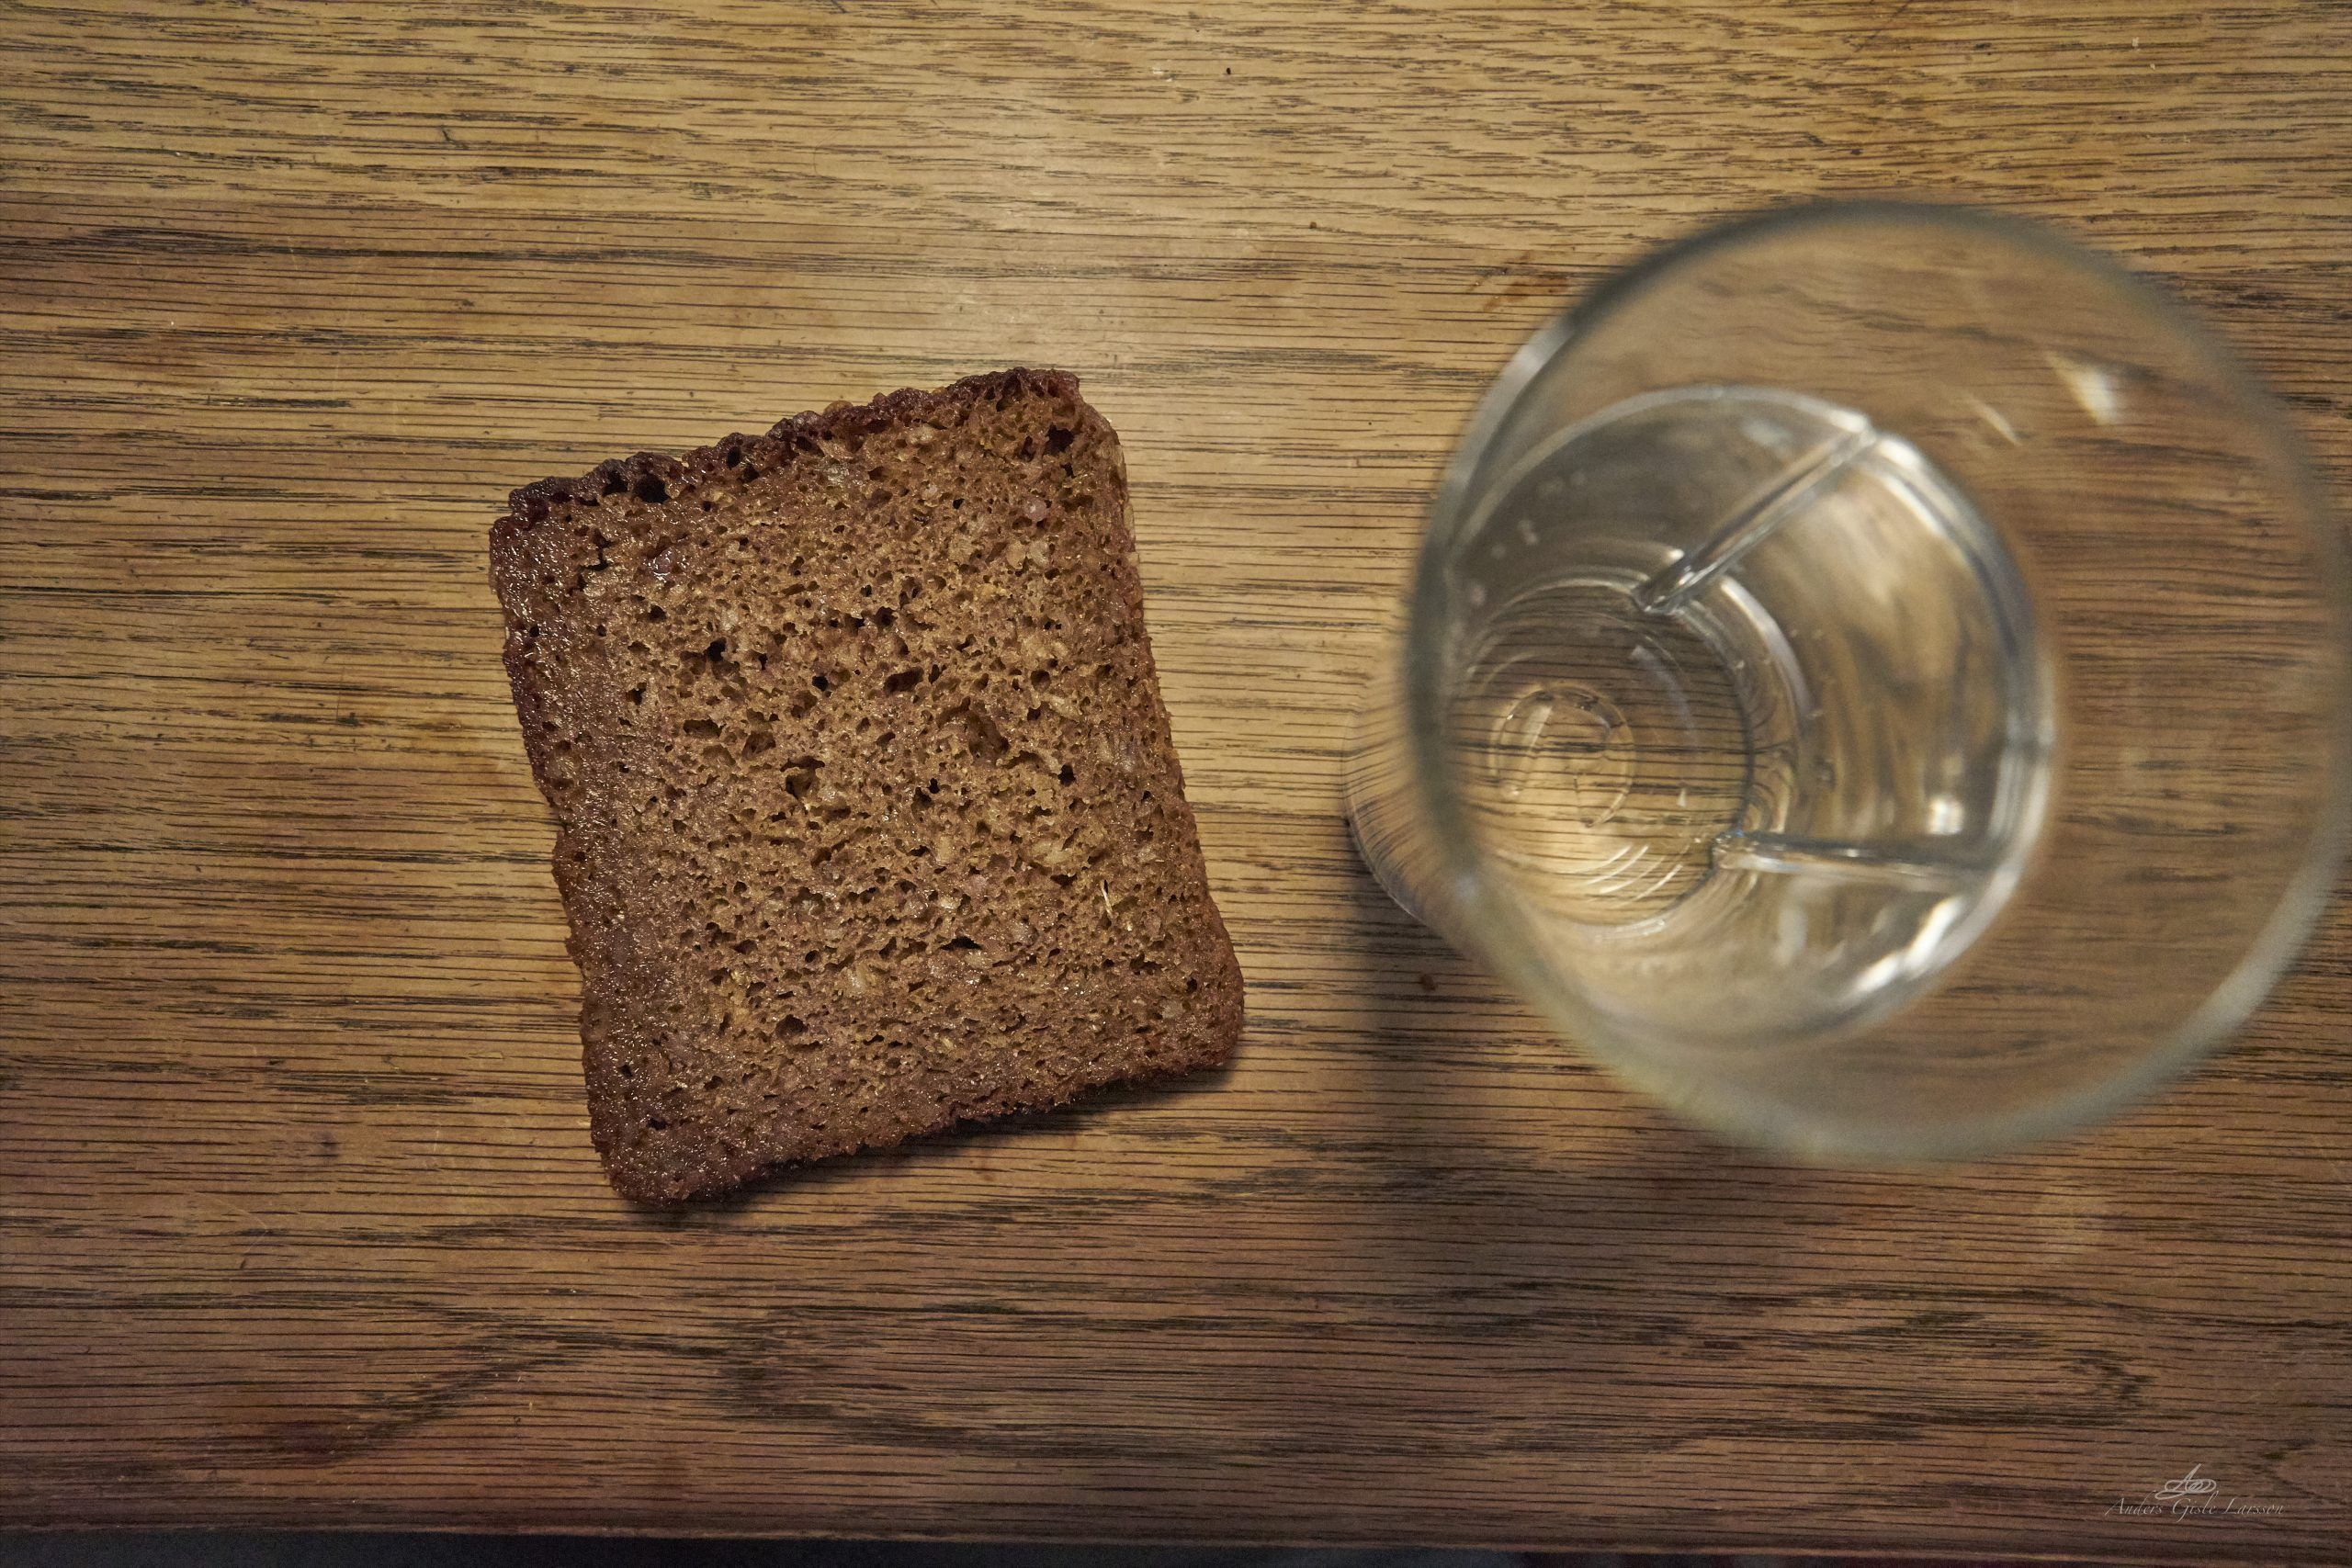 Vand & Brød, Mad, Uge 9, 62/365, Assentoft, Randers